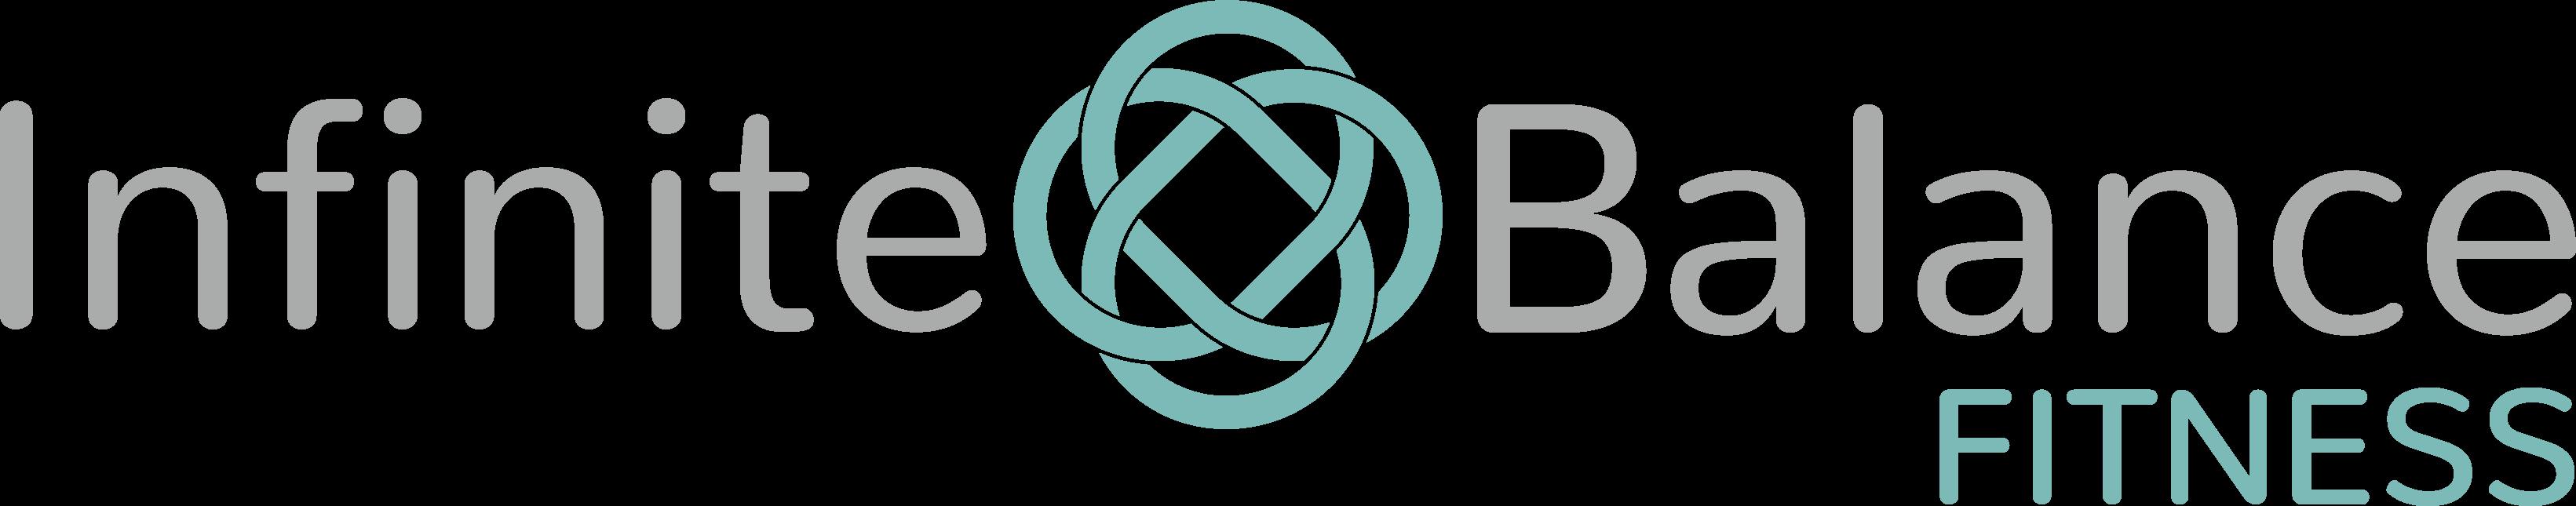 Infinite Balance Logo Fitness